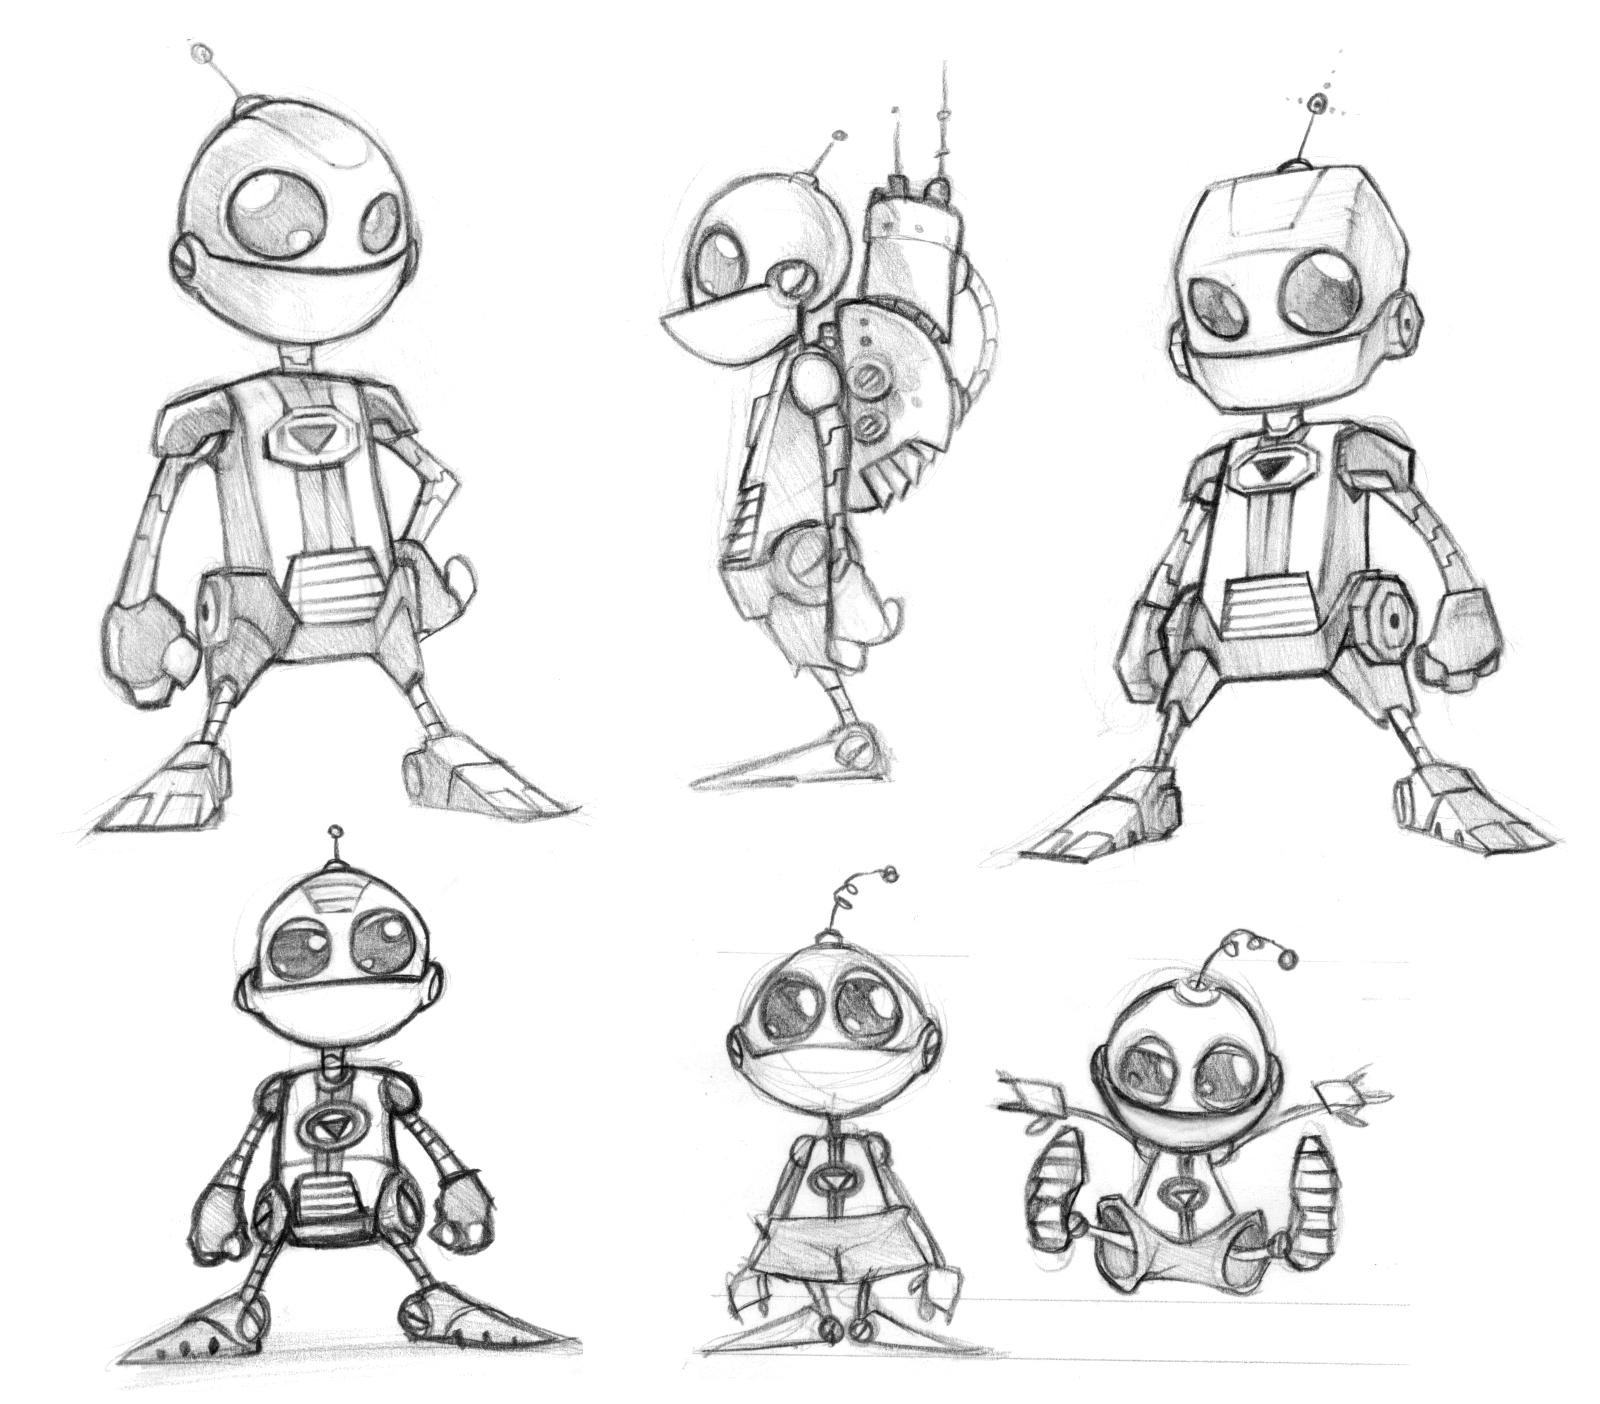 Min U Robot